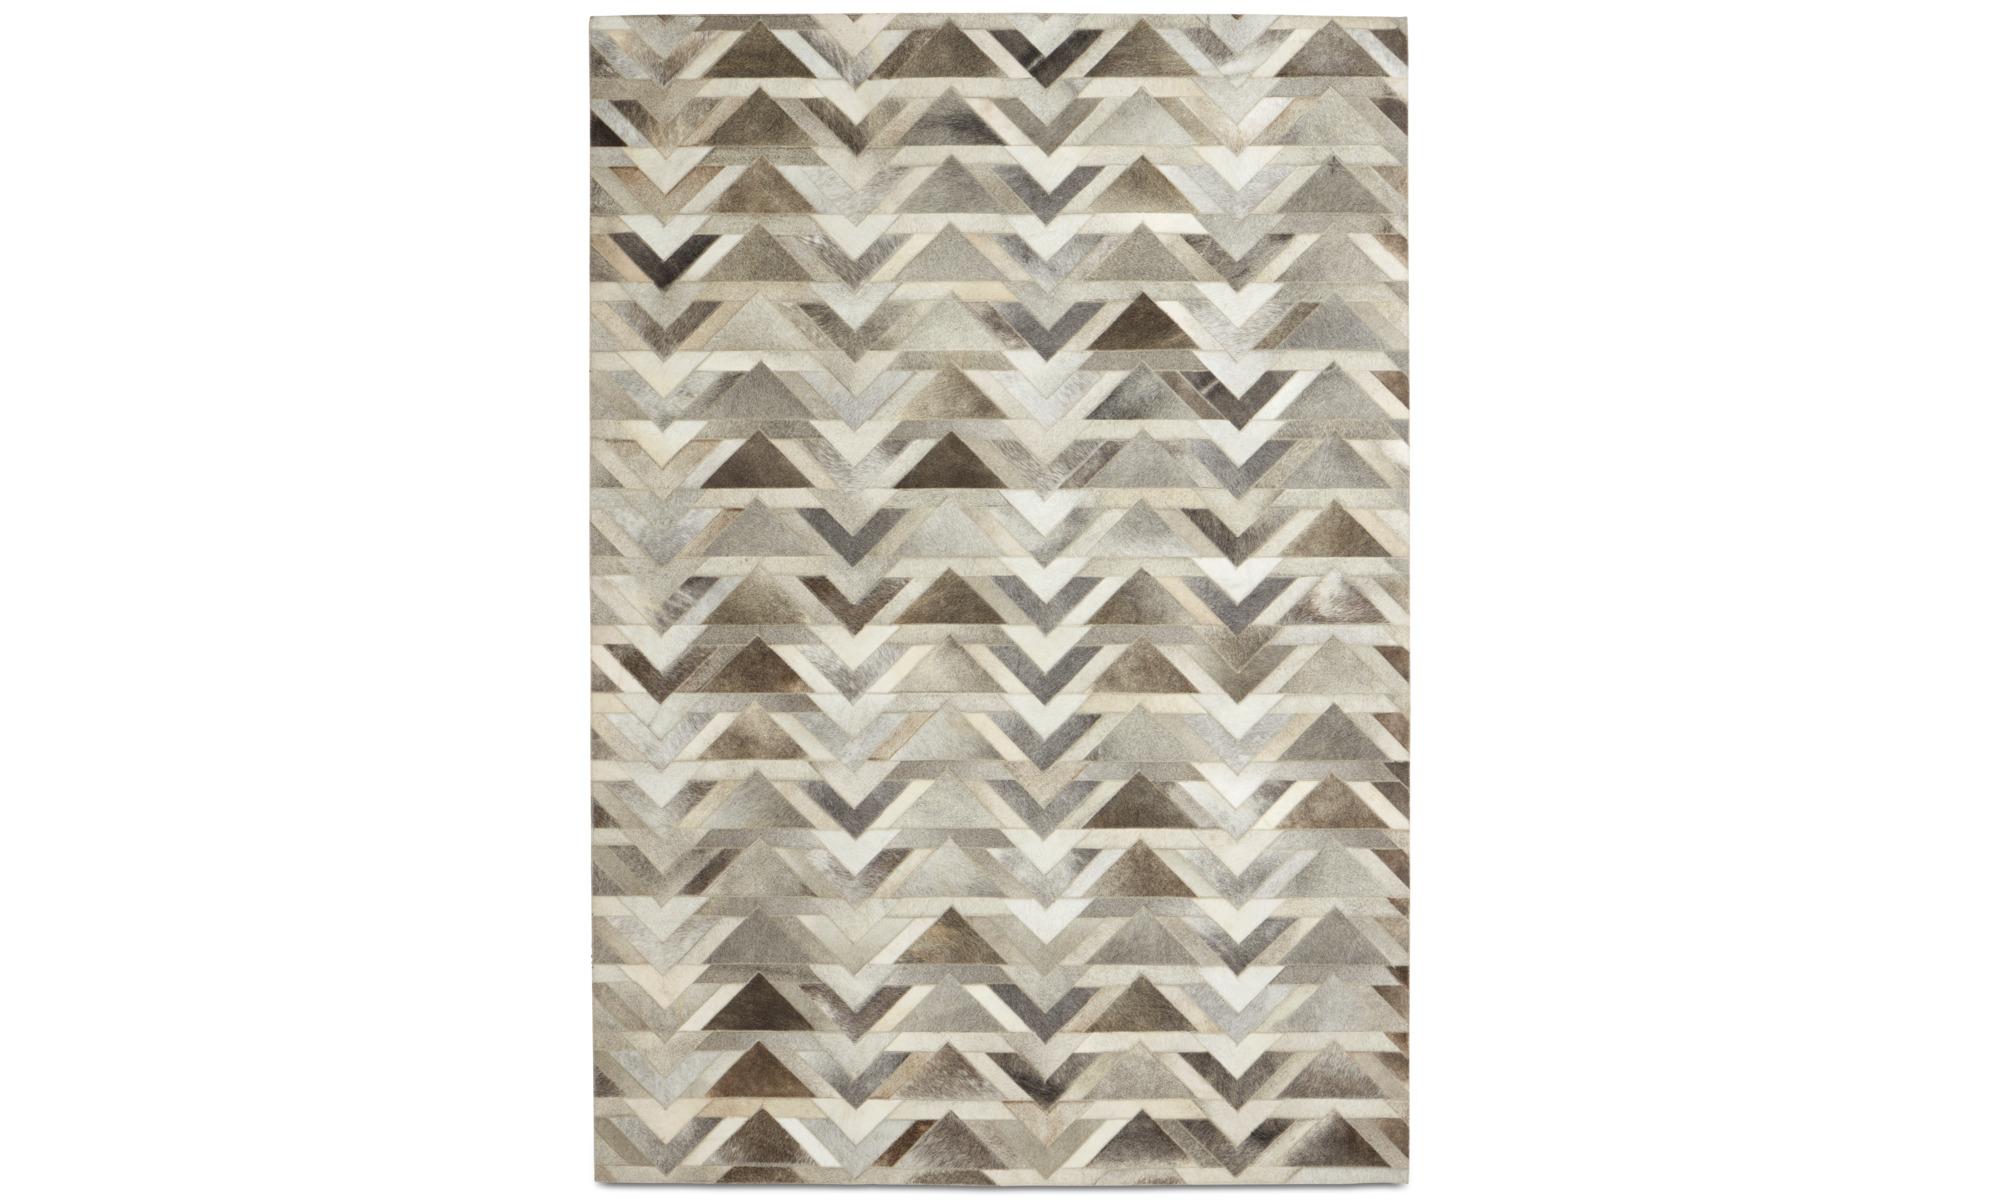 Teppiche - Arrow Teppich - rechteckig - Grau - Leder